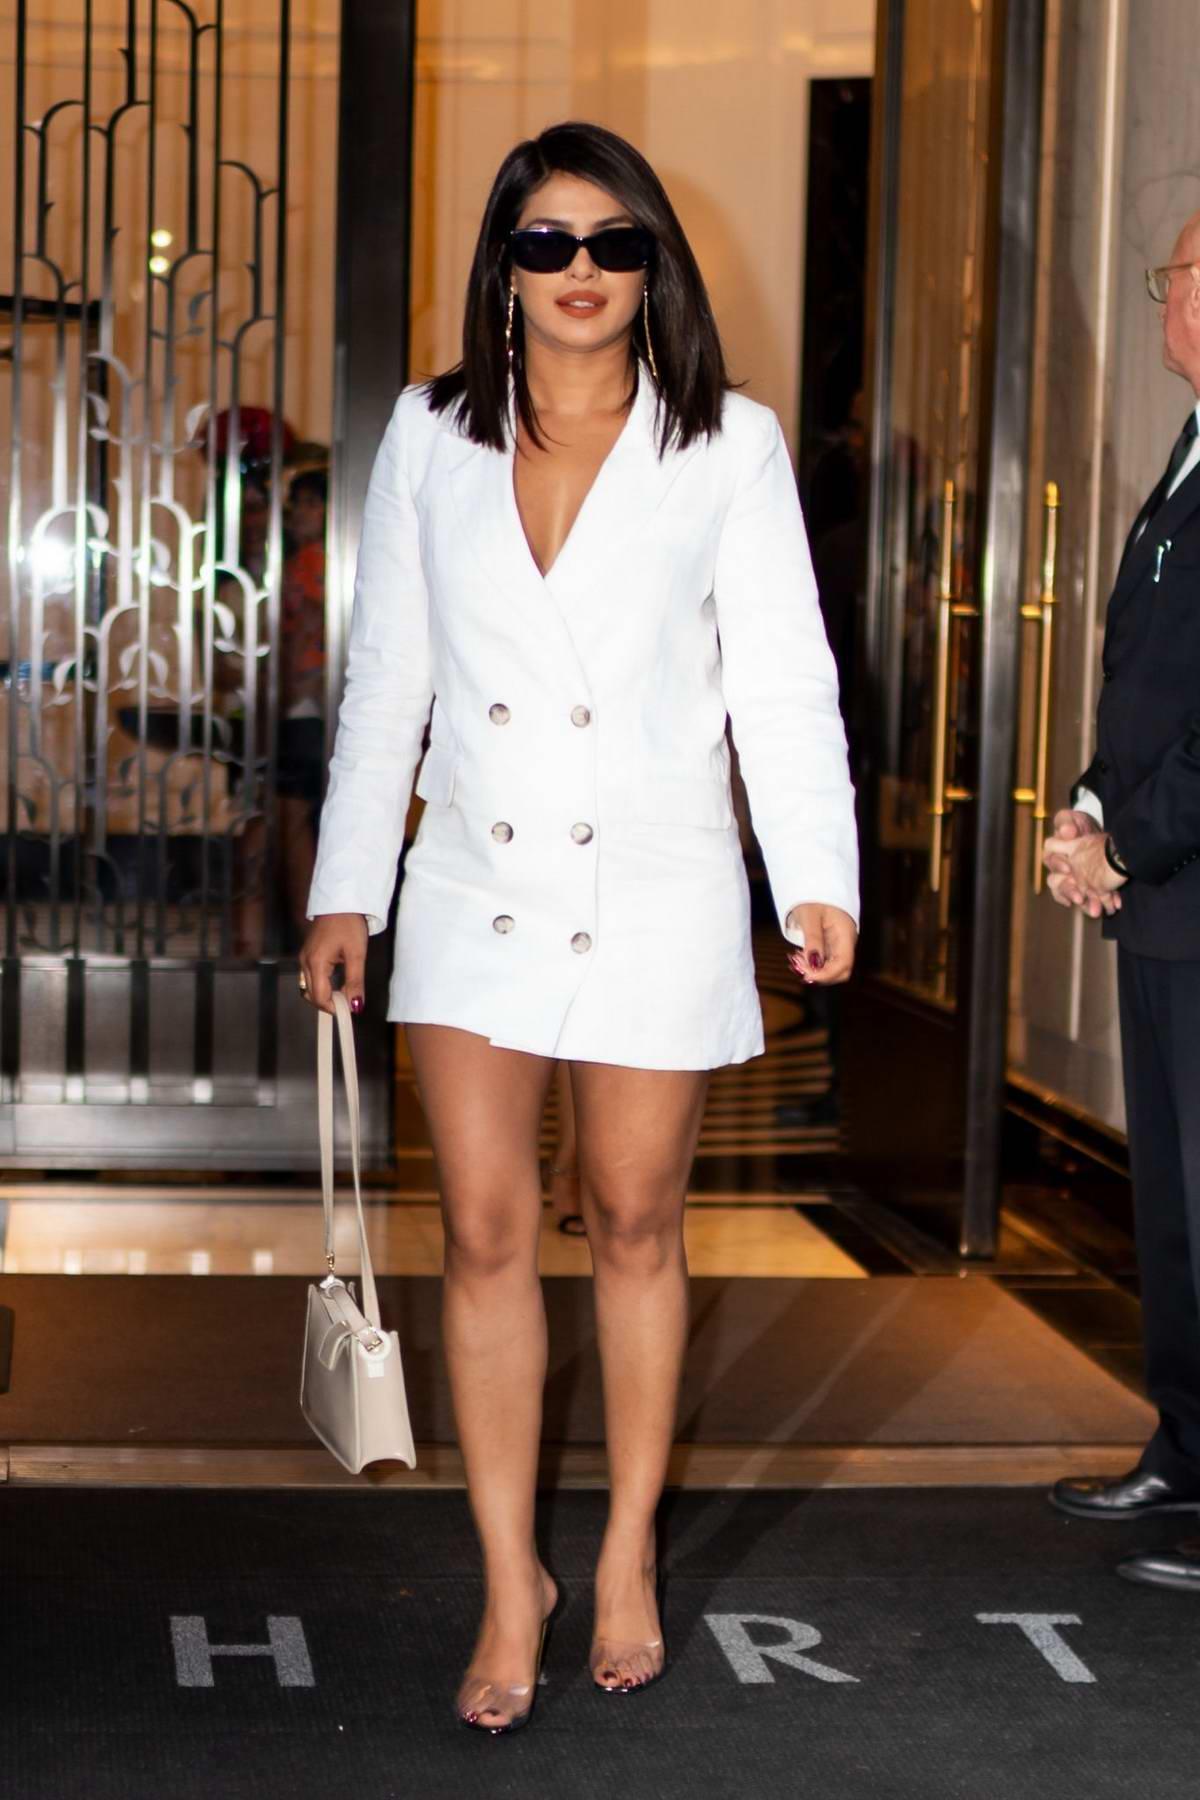 Priyanka Chopra keeps it business casual as she steps in a white blazer dress in Tribeca, New York City